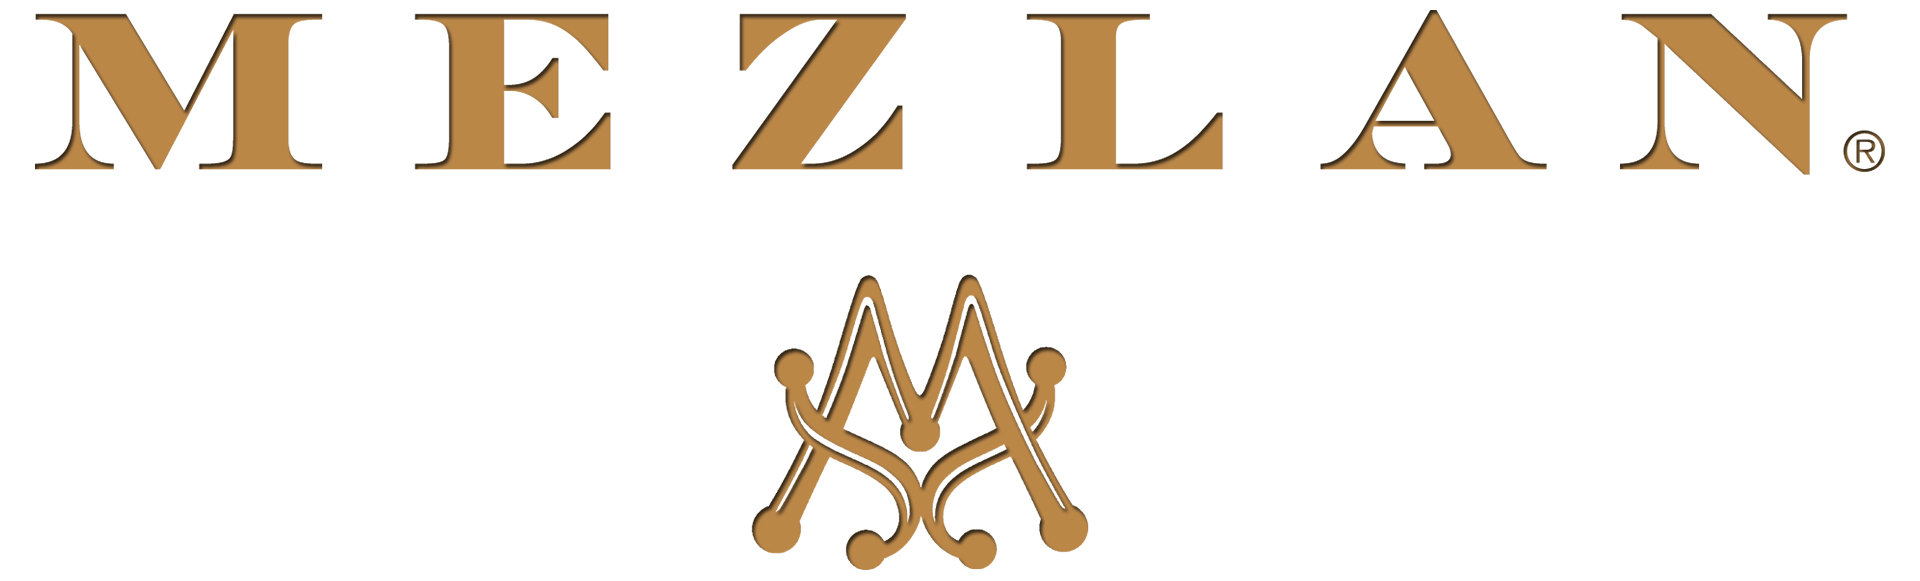 mezlan-logo-1920x.jpg